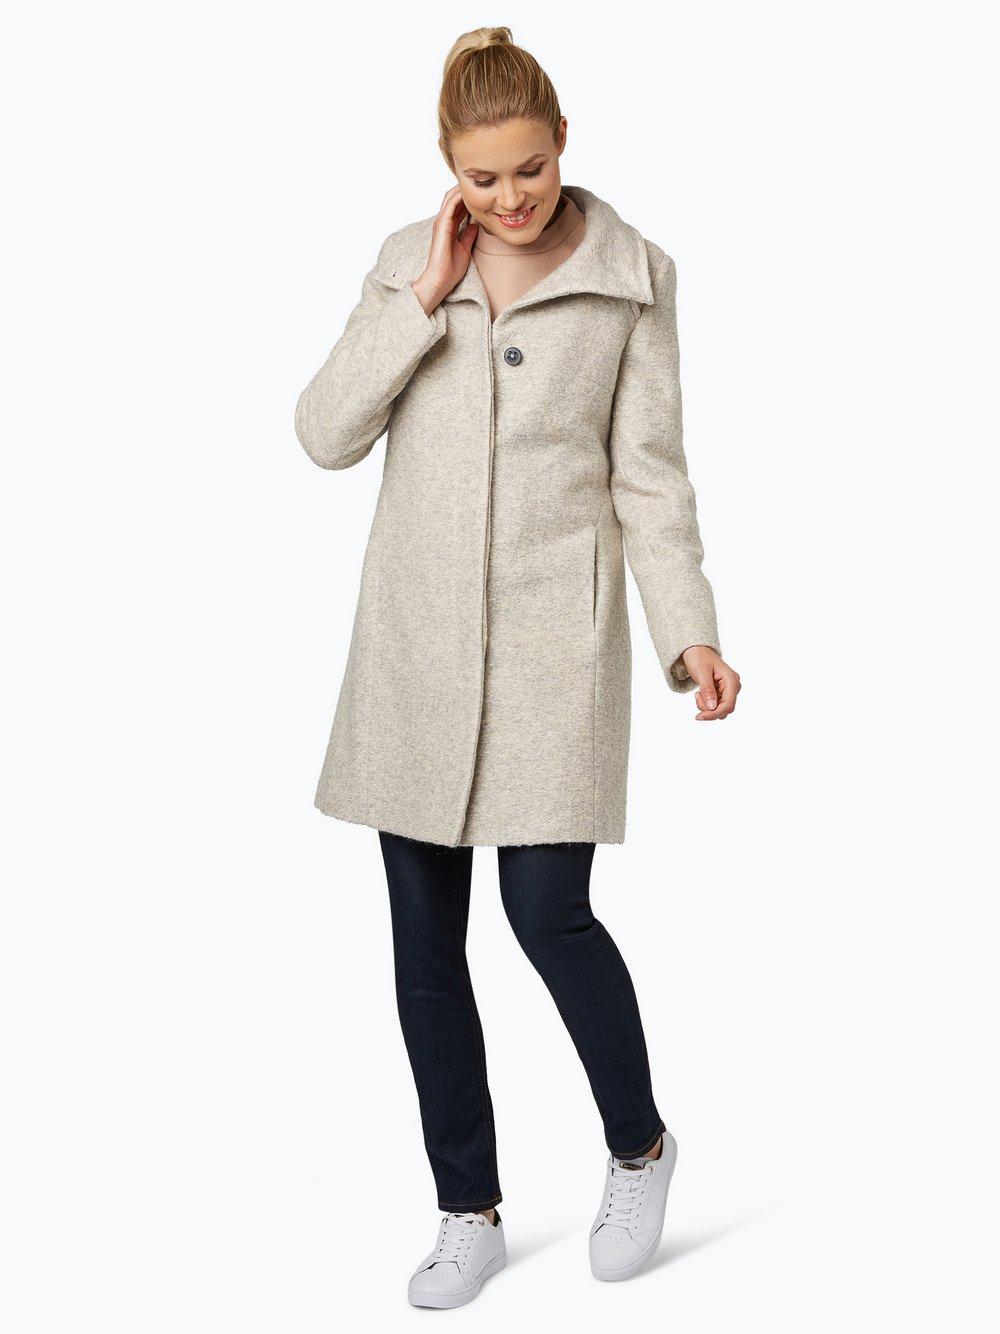 Damen Mantel mit Mohair-Anteil - Okirana4 schwarz HUGO BOSS RcRee